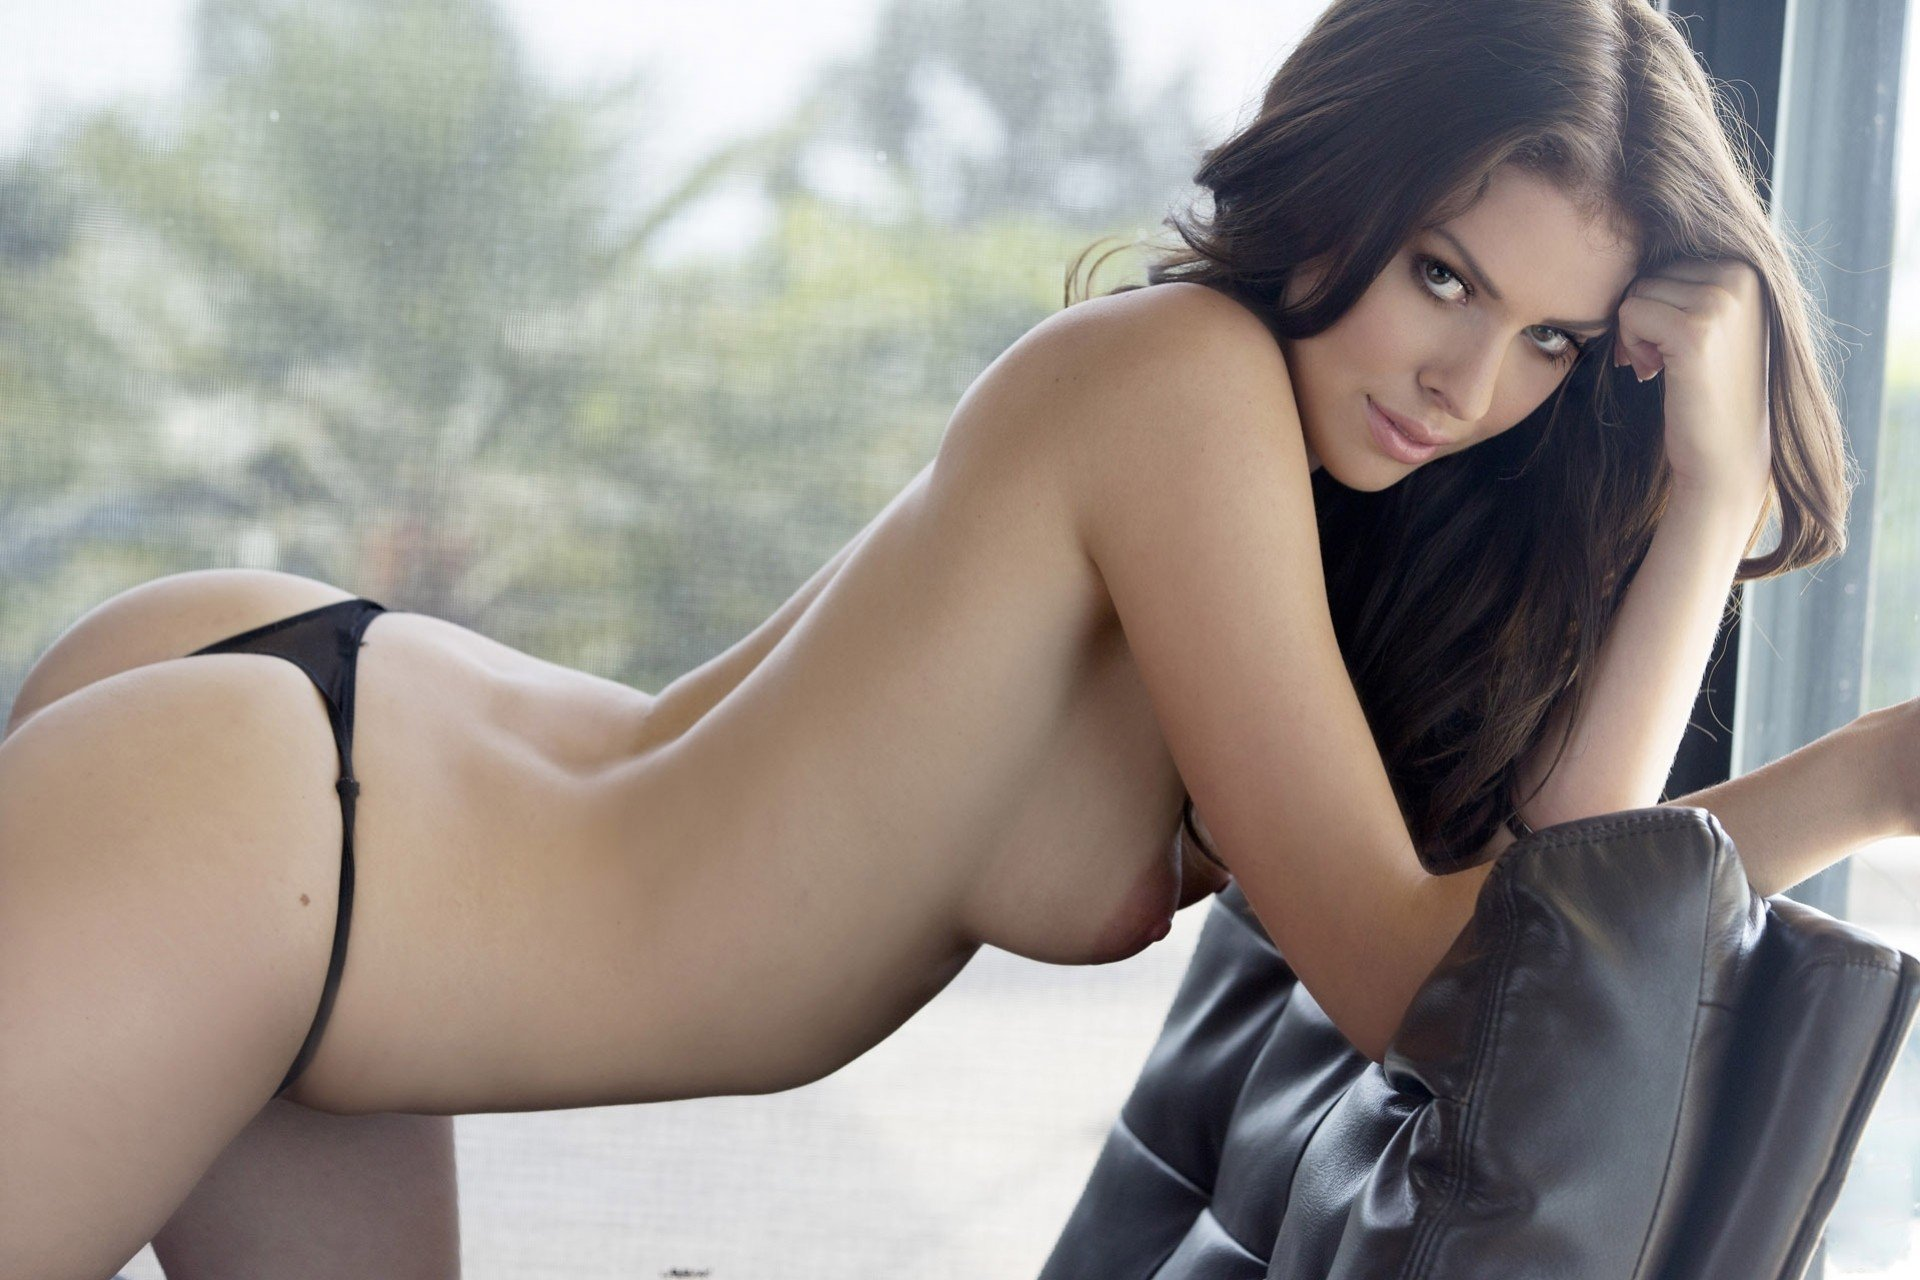 Drunk hot swedish women real nude girl thin vids of adult discipline